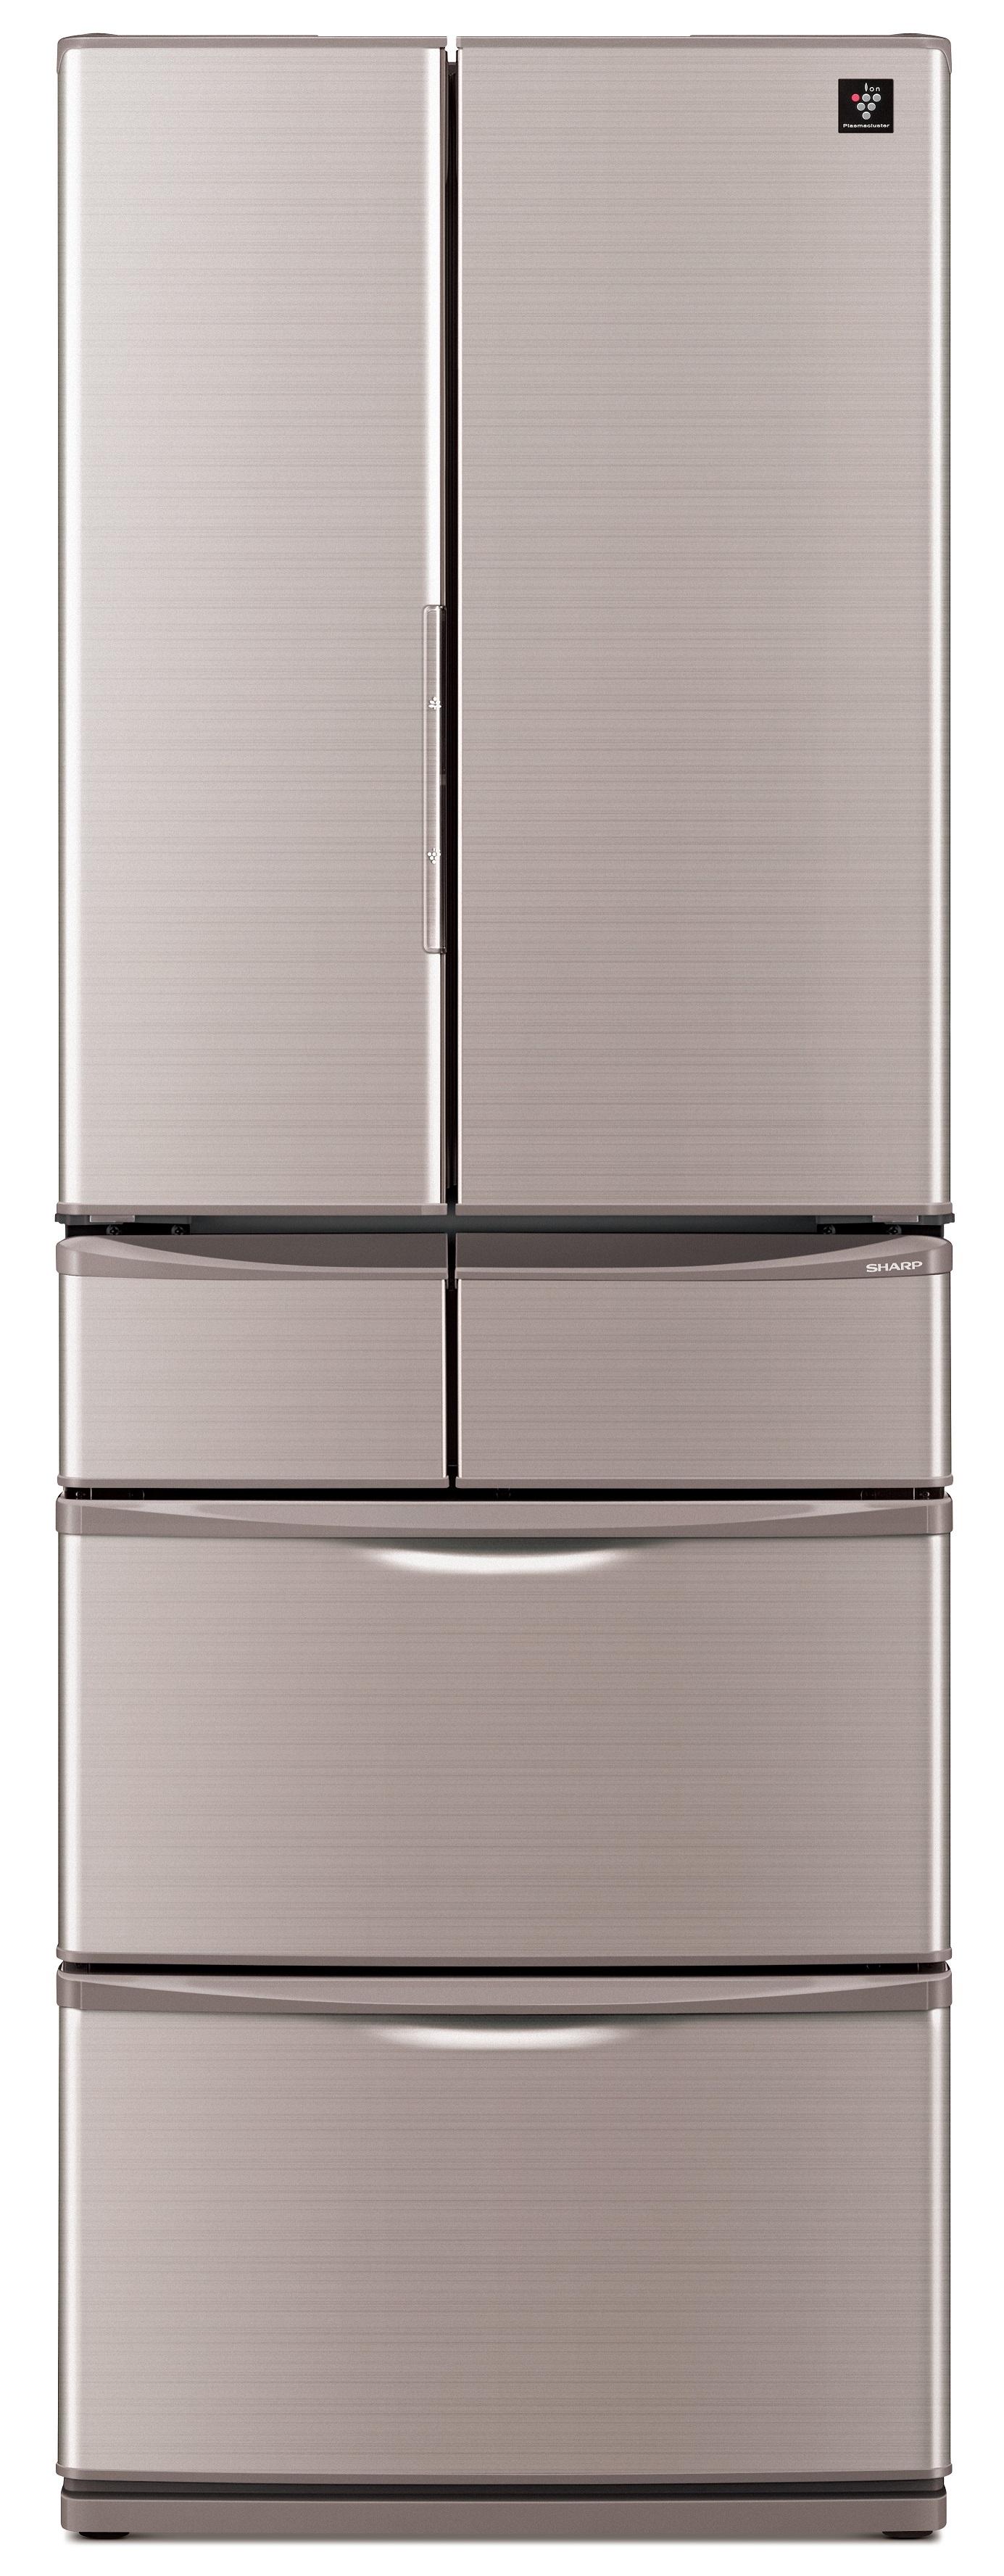 SHARP 夏普 SJ-XF47BT-T (晶燦棕) 變頻六門對開冰箱 (465L) ~日本製~【零利率】※熱線07-7428010